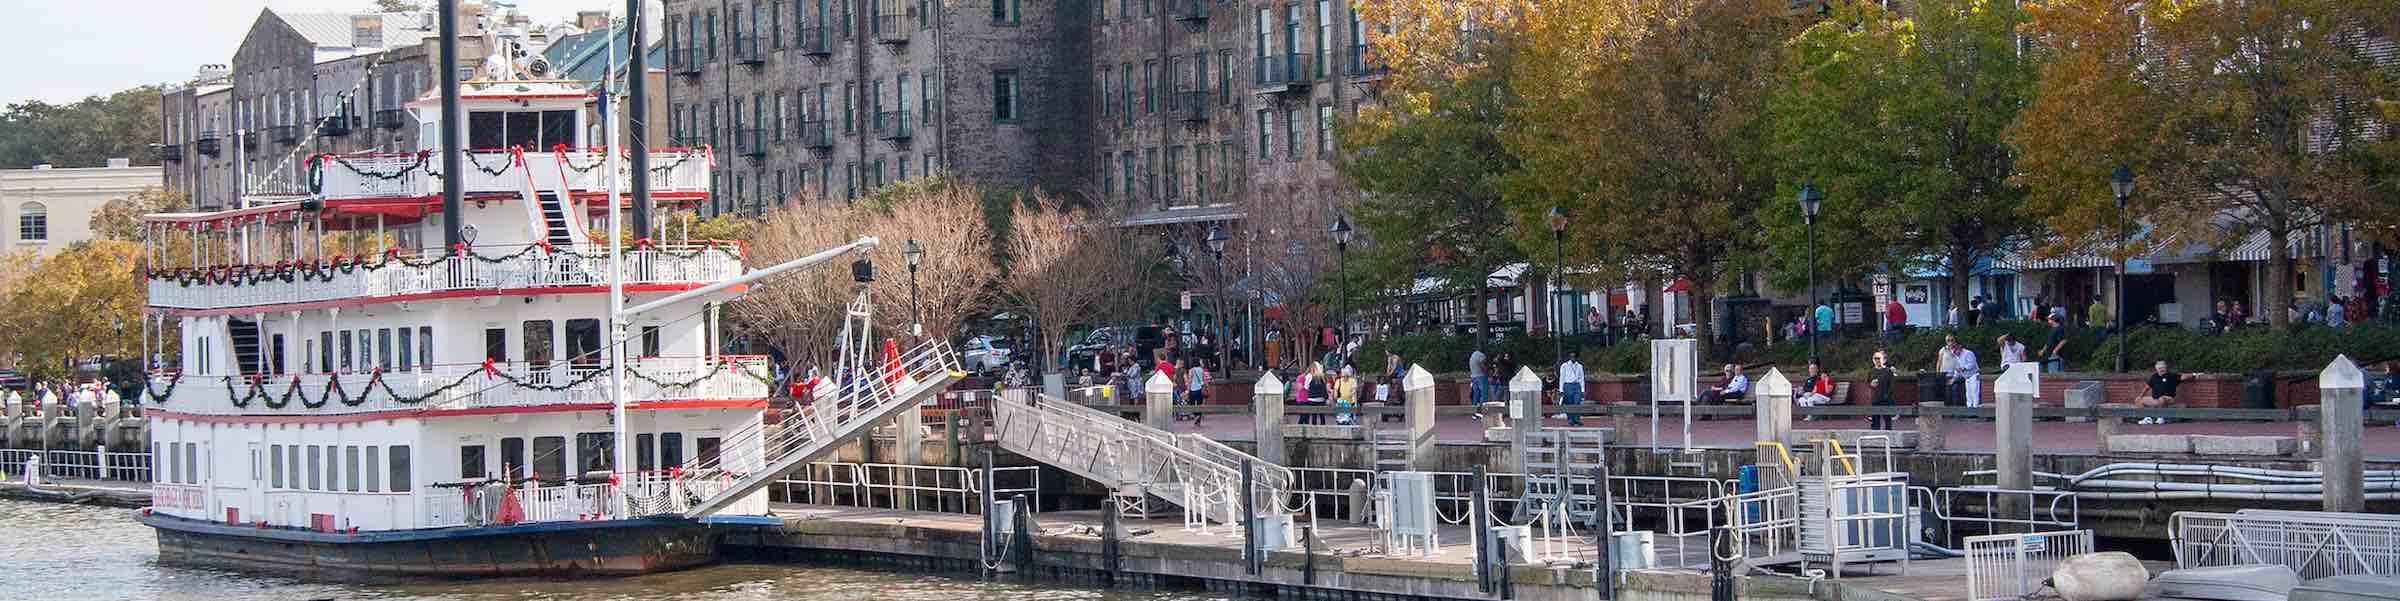 Savannah Christmas On The River 2020 River Street, Savannah Events 2020 2021